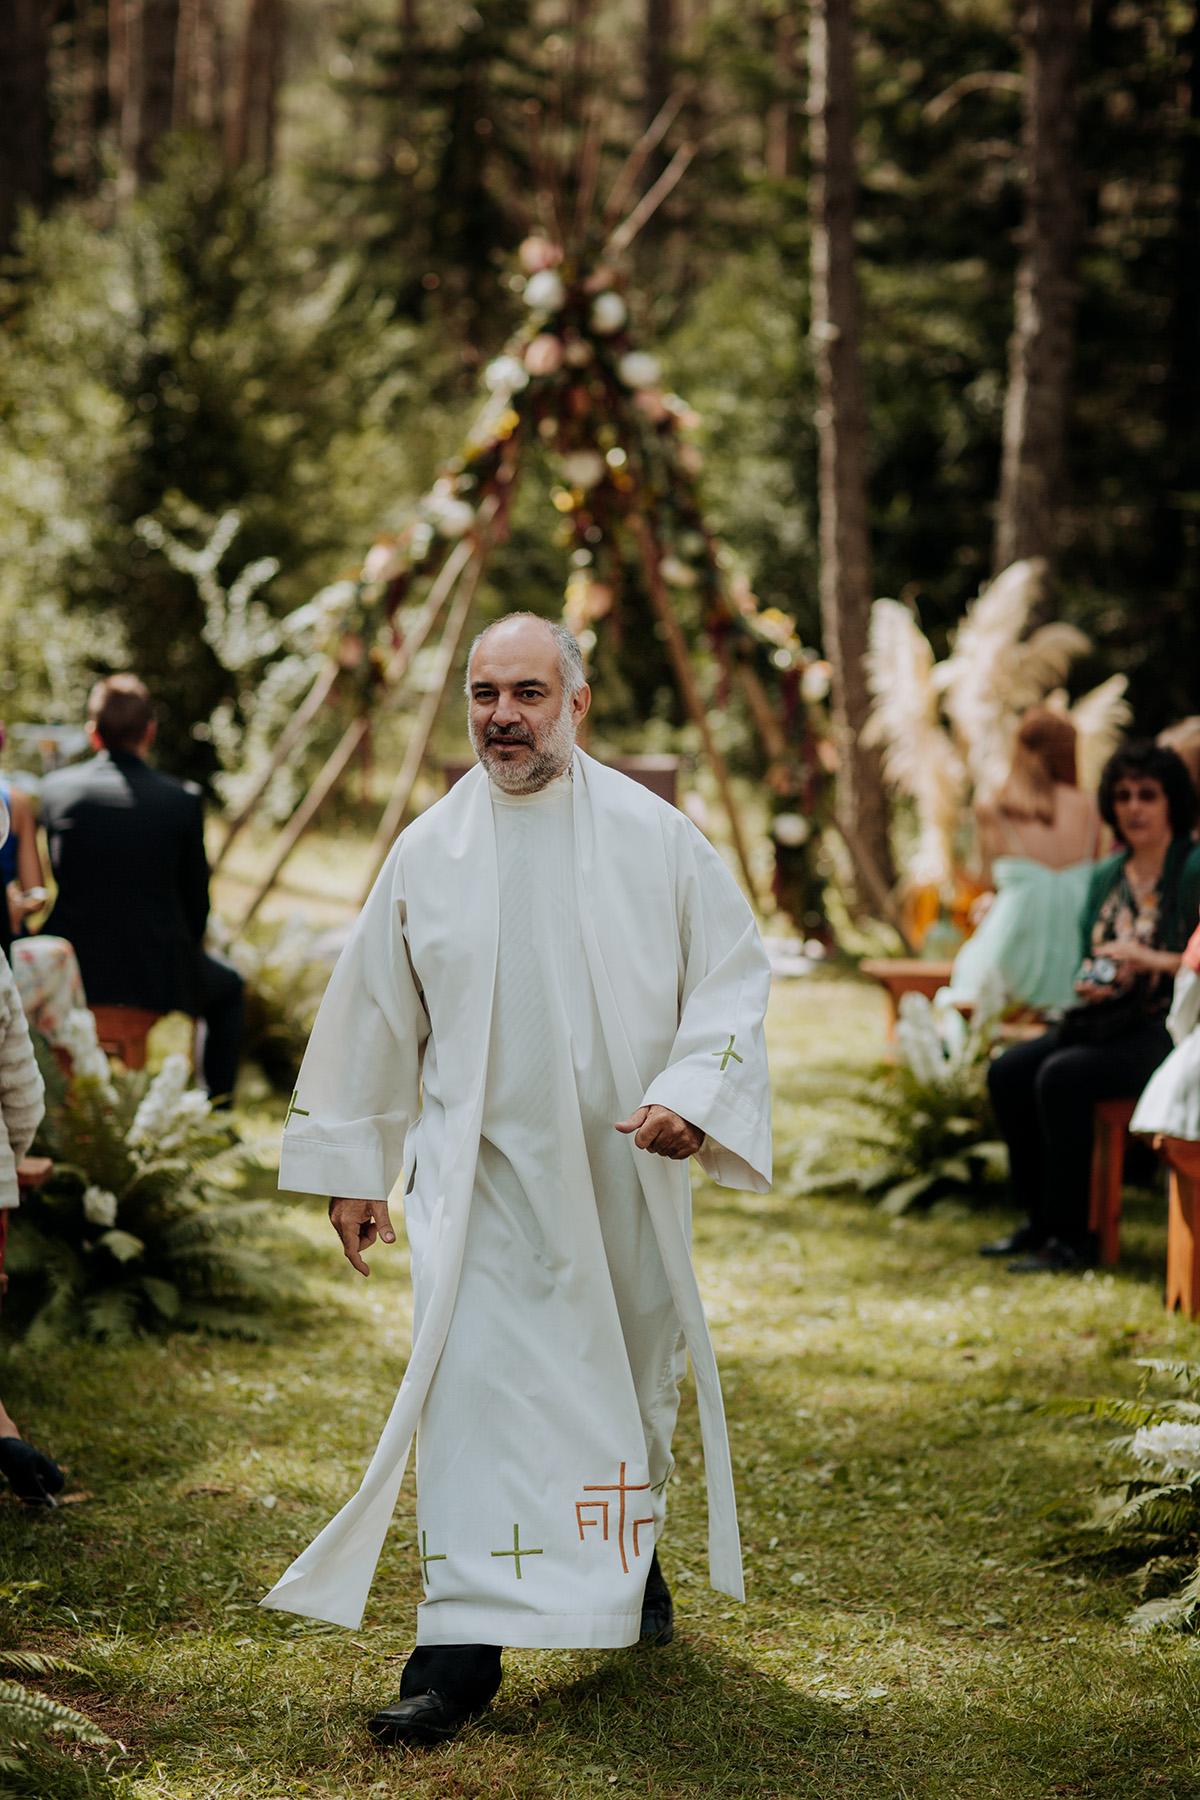 Boda-civil-zaragoza-huesca-pineta-pirineos-aragon-jose-reyes-destination-wedding_013.jpg